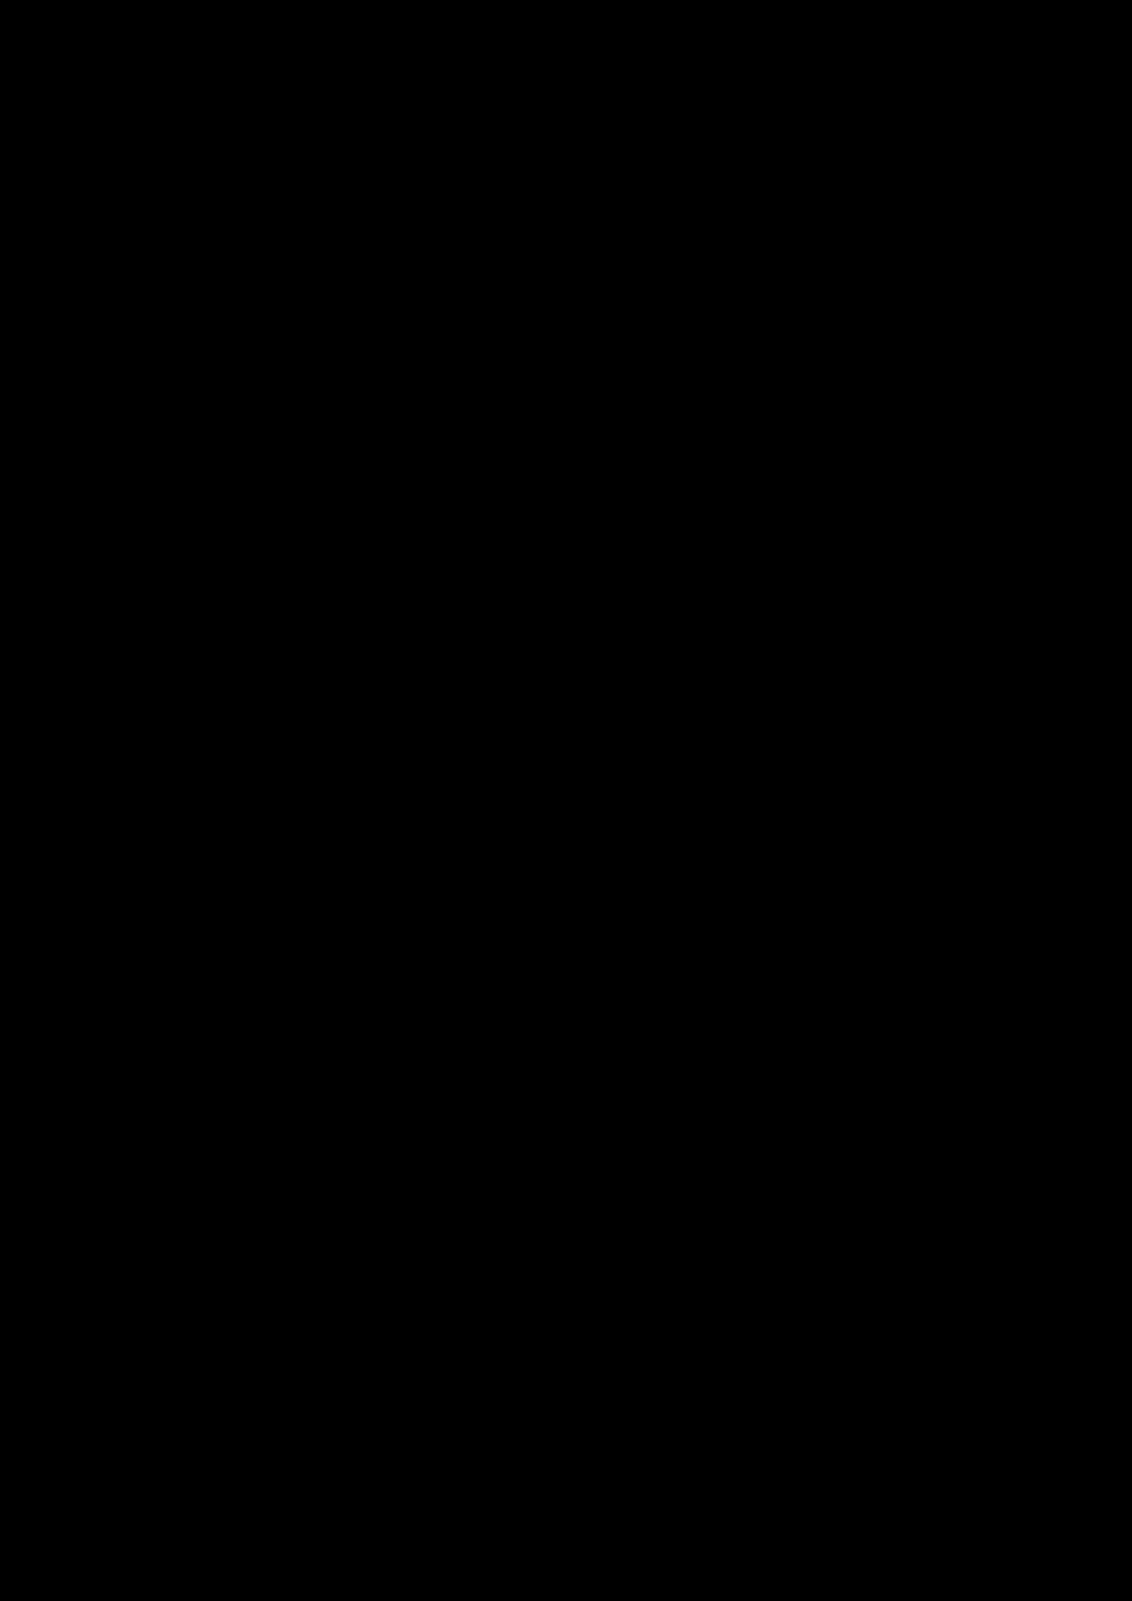 Belyiy sokol slide, Image 137